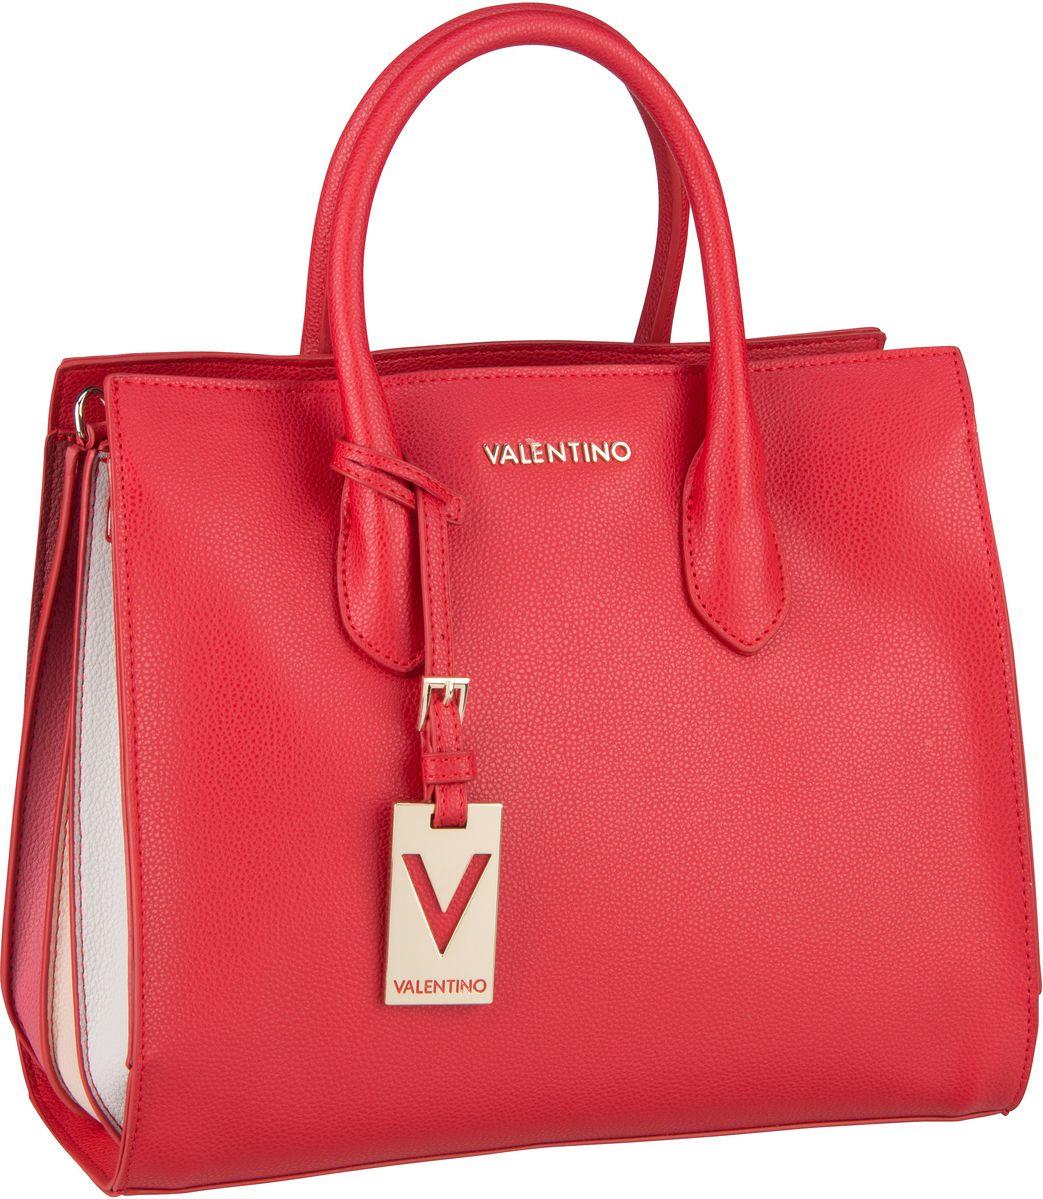 Handtasche Summer Memento Shopping 101 Rosso/Multicolor